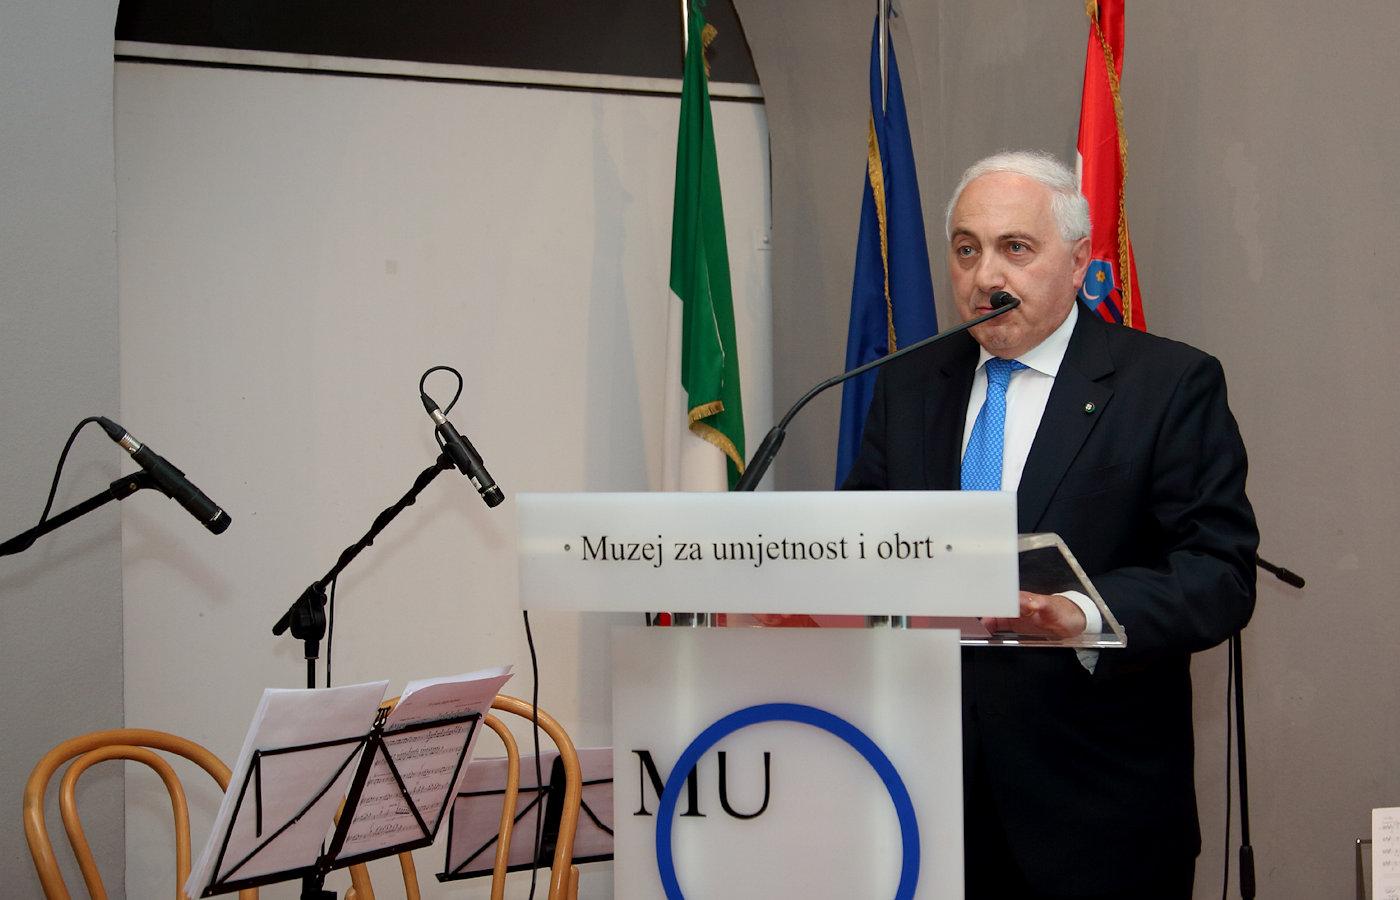 Italian Ambassador Adriano Chiodi Cianfarani